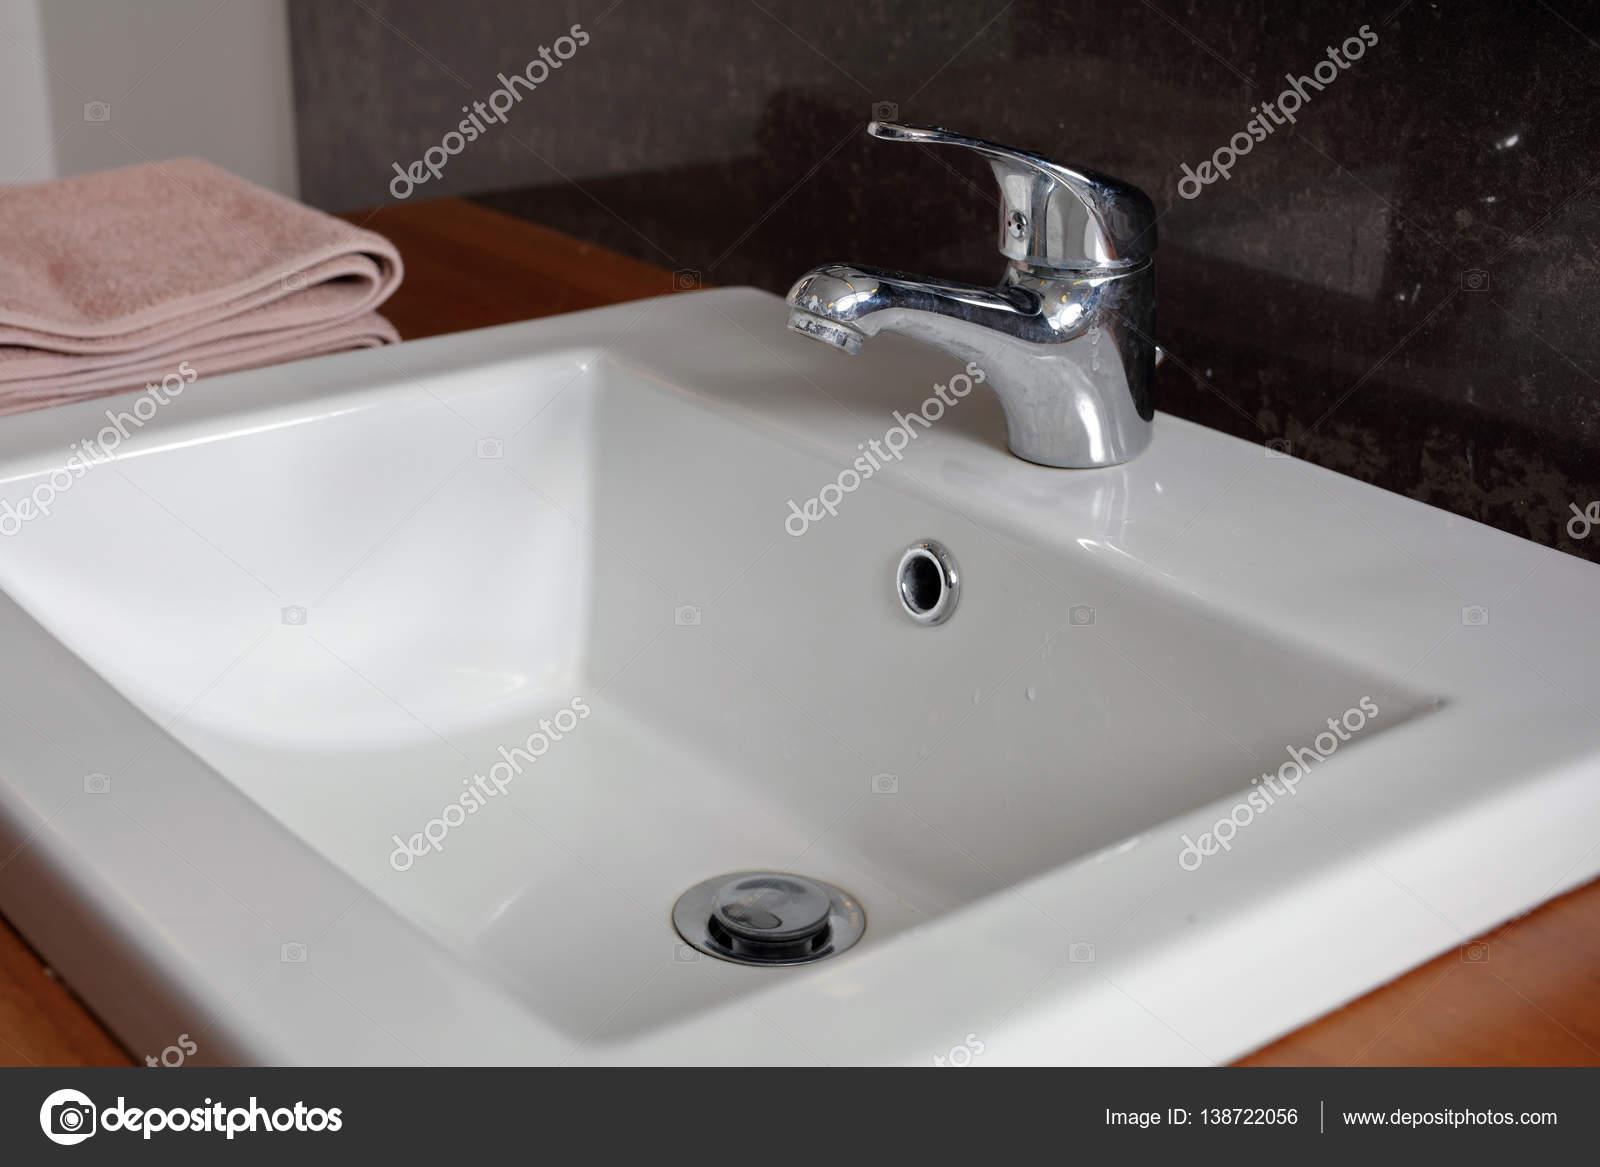 Lavandino del bagno, lavabi. Articoli sanitari in stile moderno ...